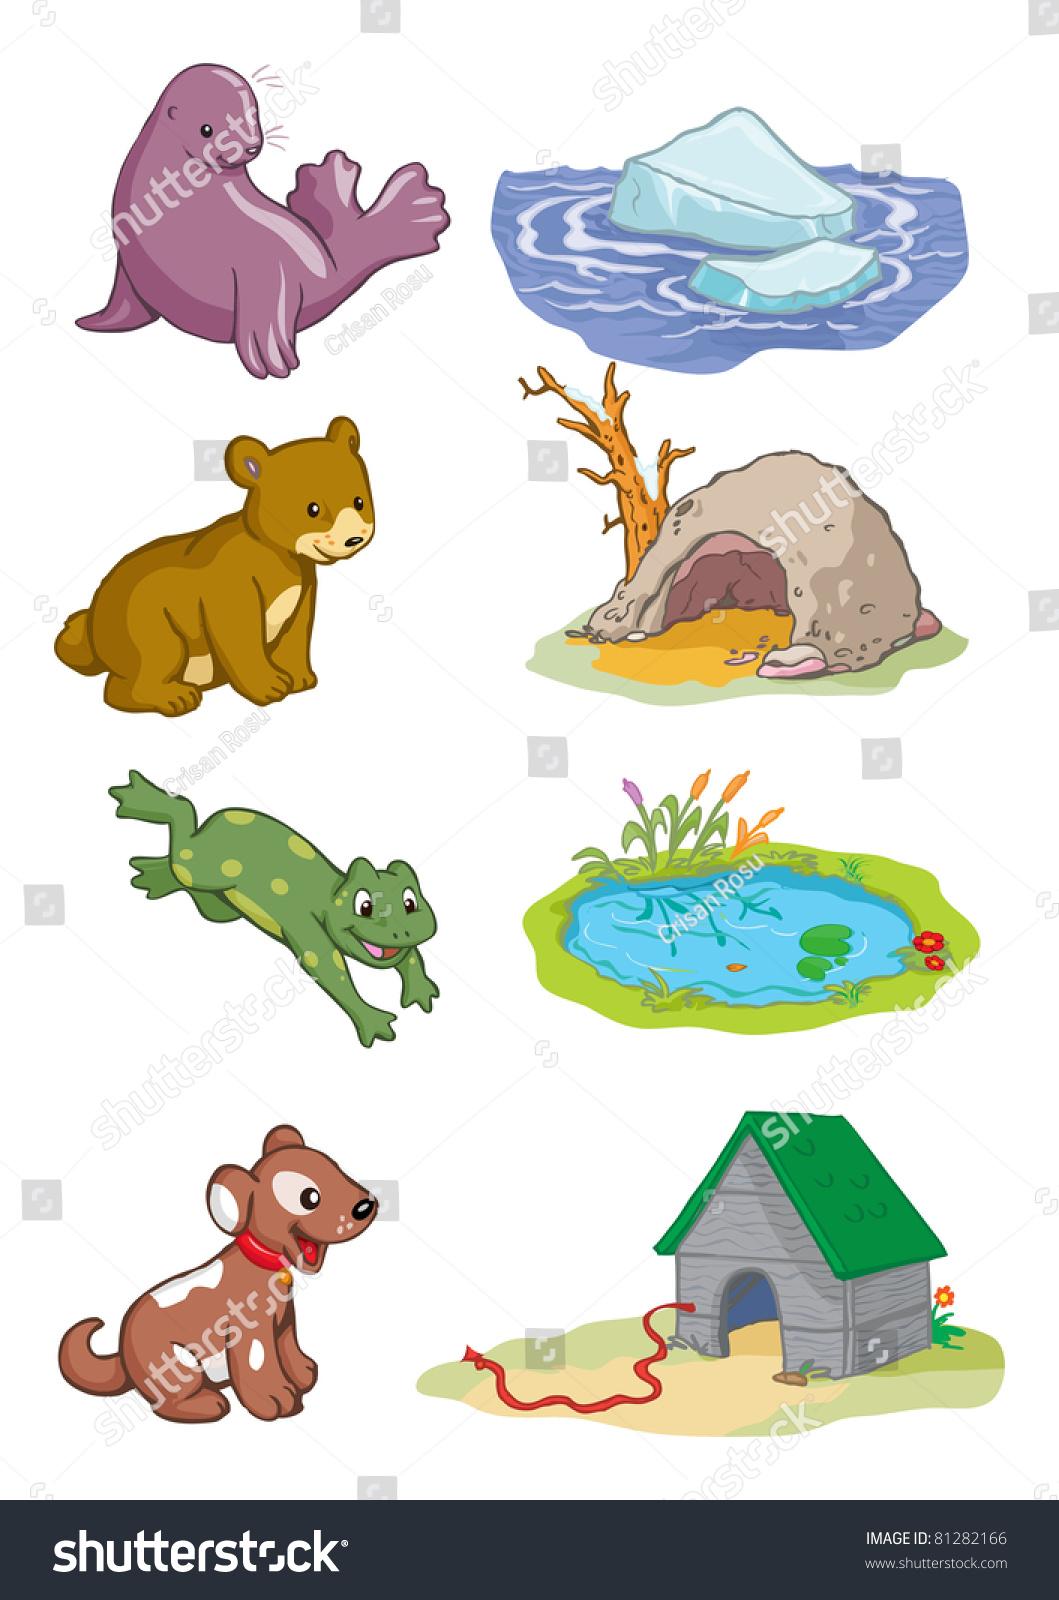 Vector Illustration Animals Habitat Cartoon Concept